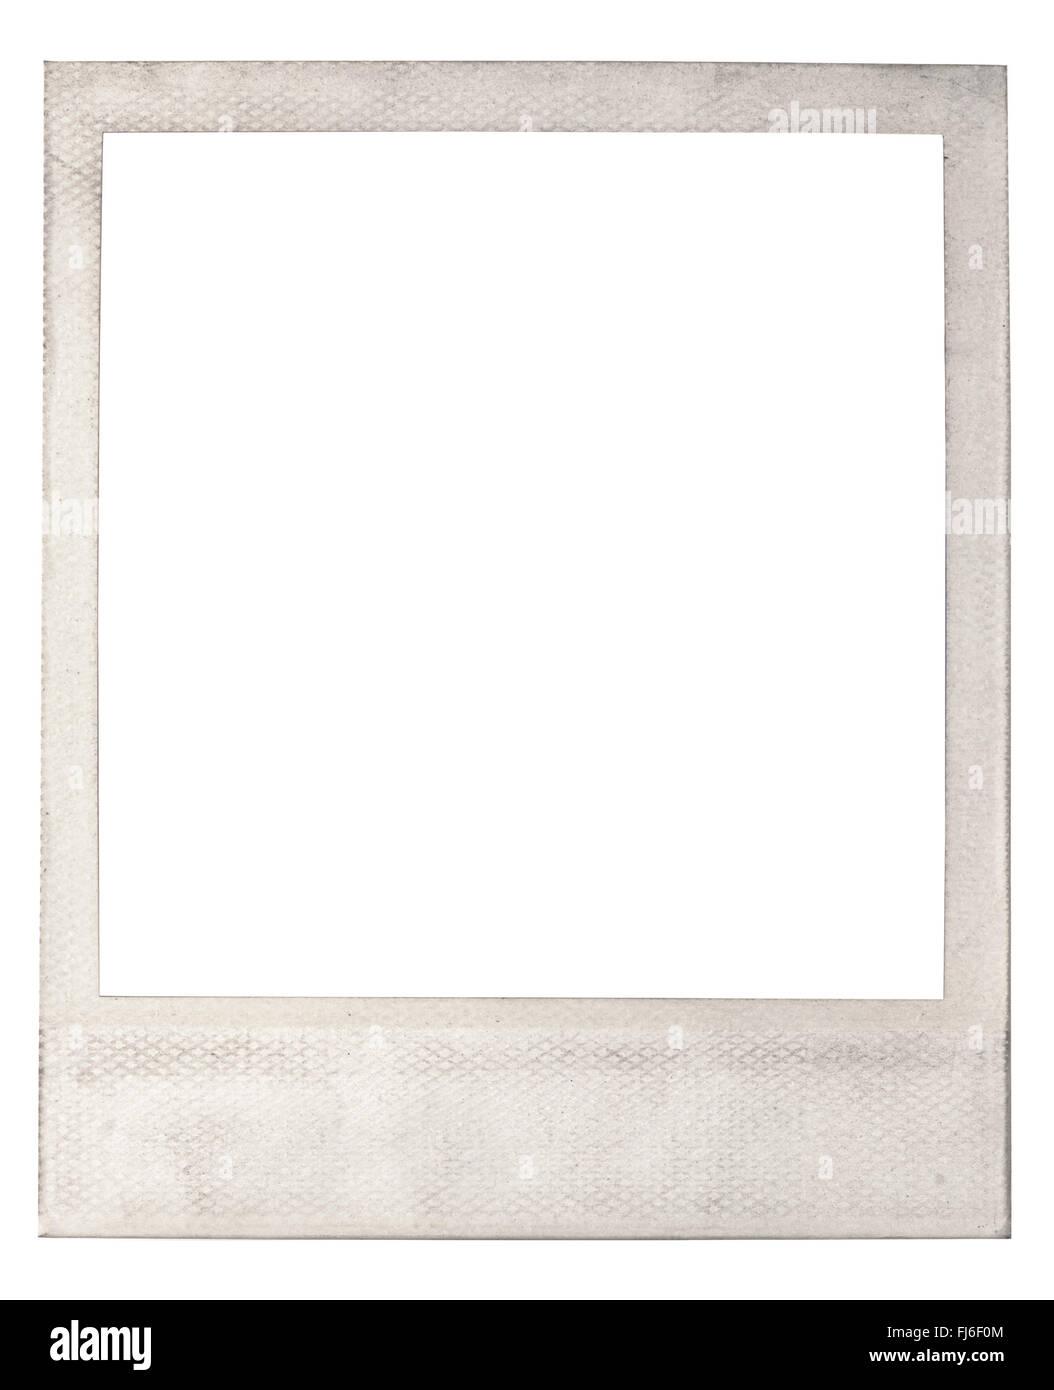 Alte leere instant Polaroid-Rahmen Stockfoto, Bild: 97259140 - Alamy